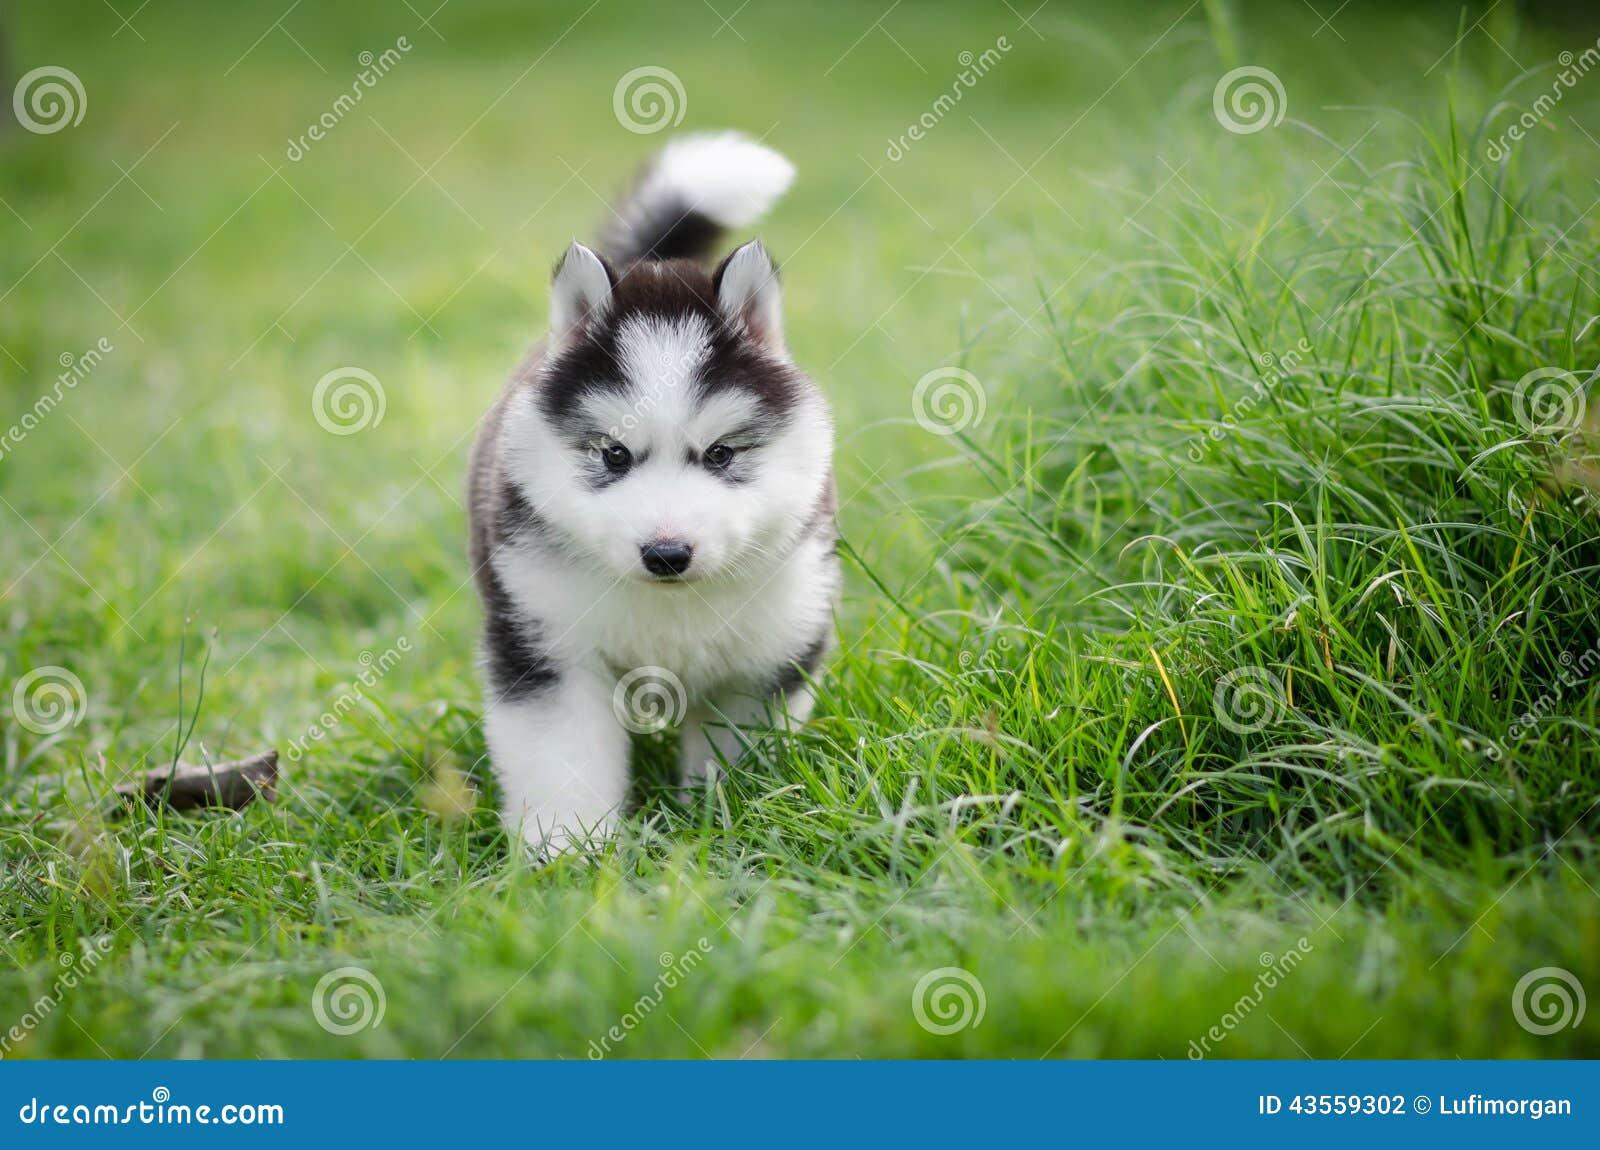 Puppy Siberian Husky On Grass Stock Photo Image Of Mammal Field